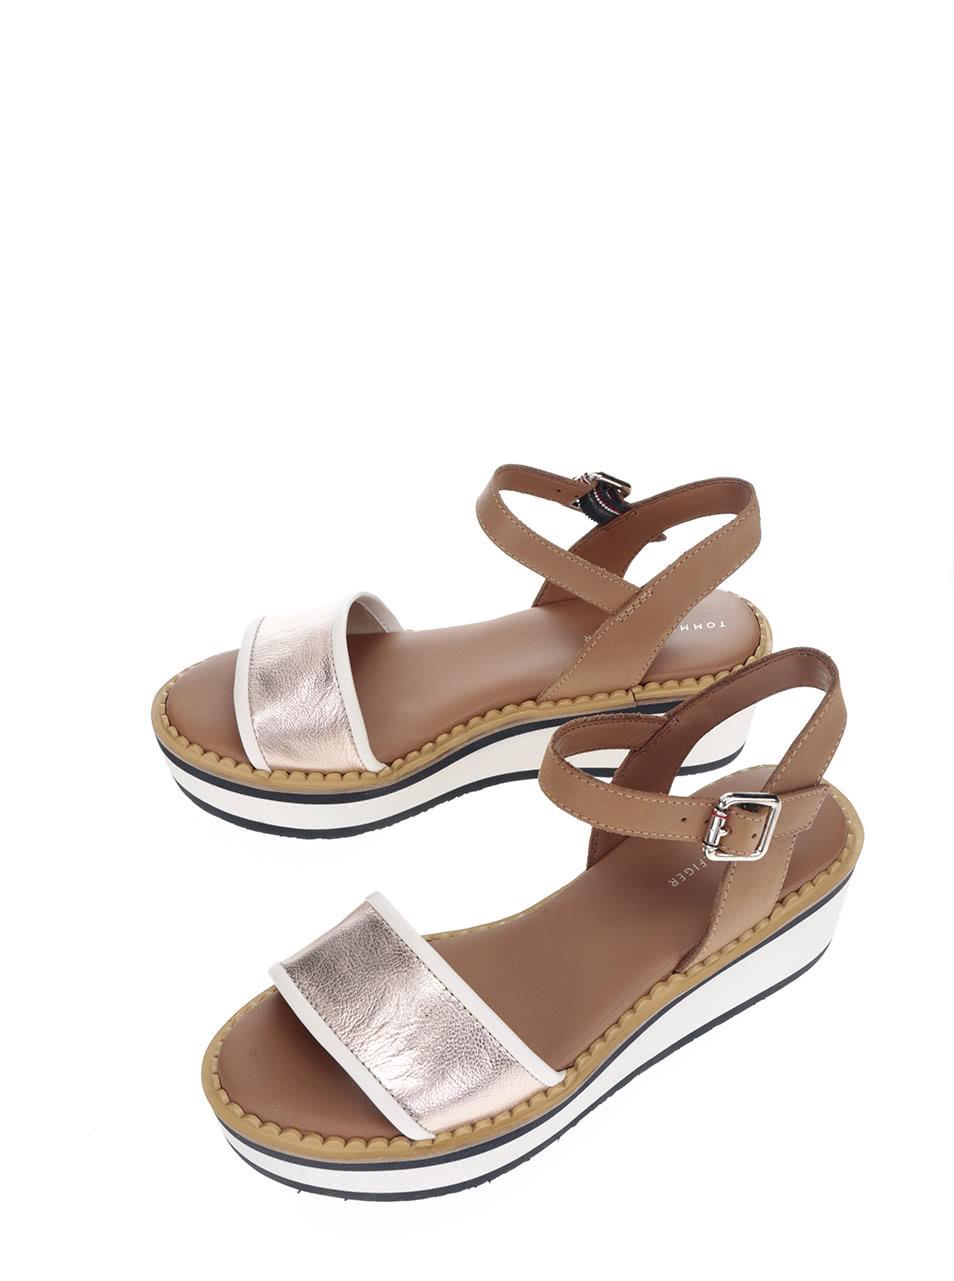 ceb20ff79cc2 Krémovo-hnedé dámske sandále na platforme Tommy Hilfiger ...